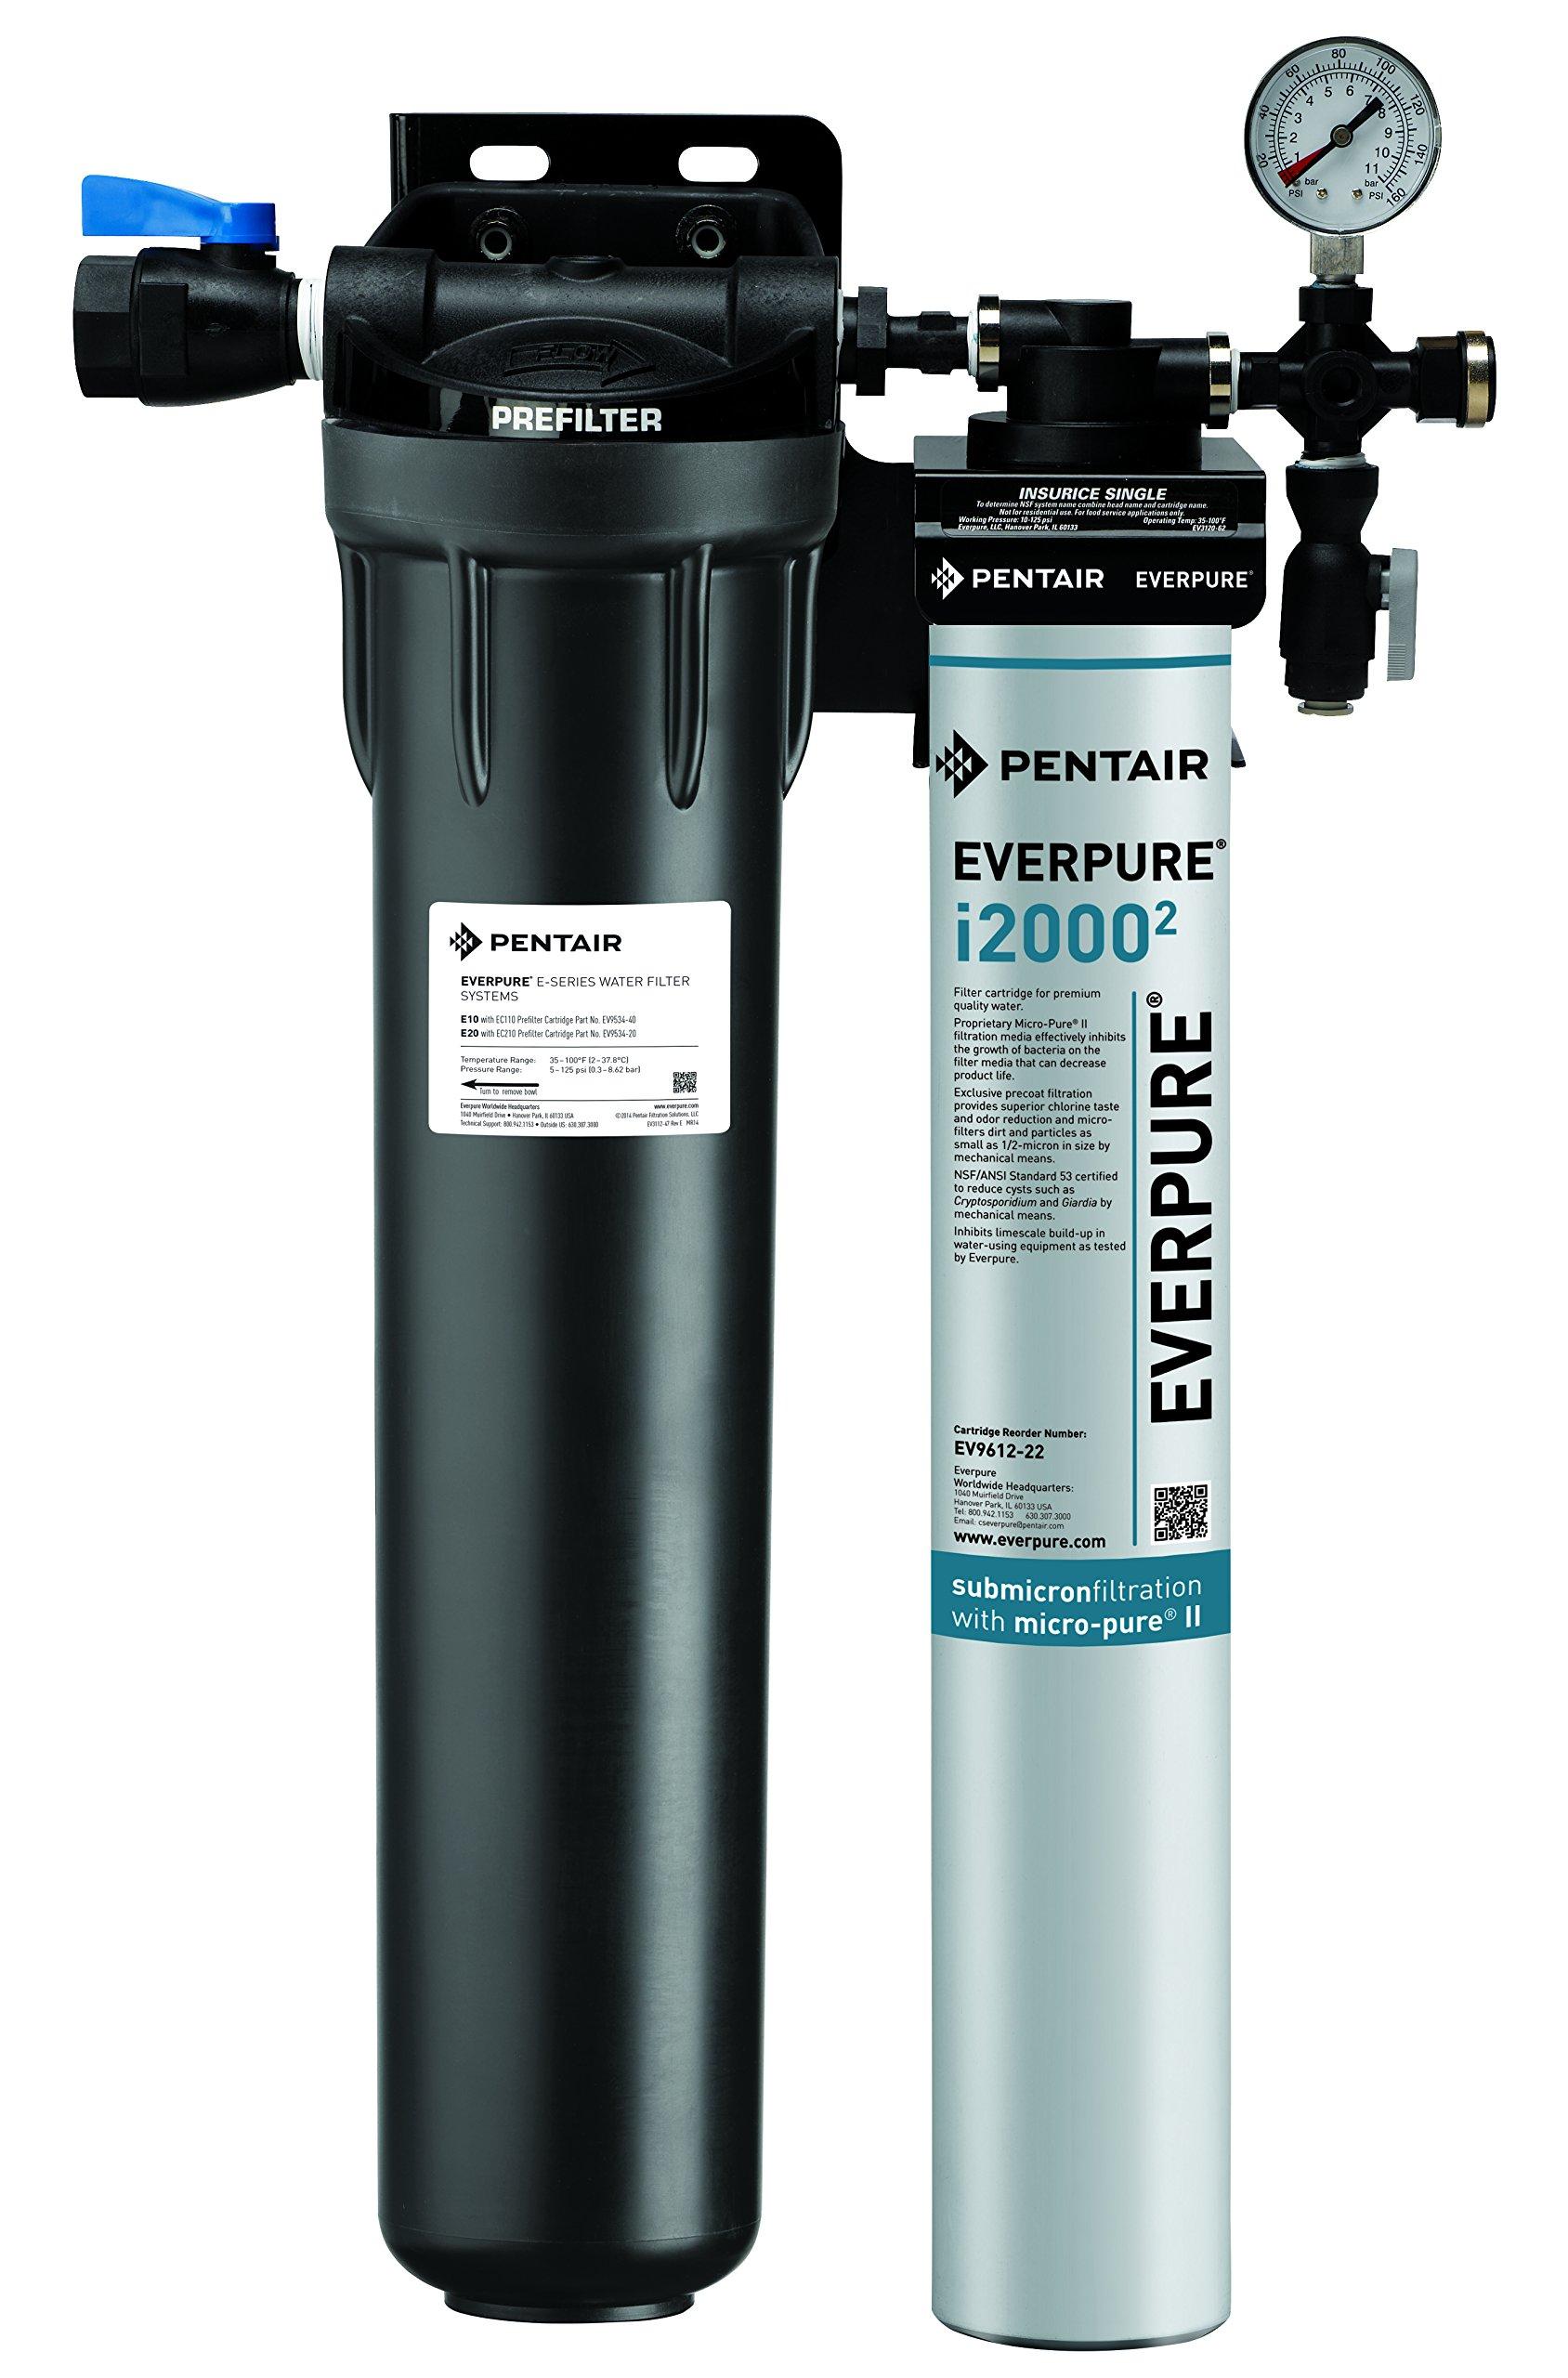 Everpure EV9324-21 Insurice Single PF i2000 2 System